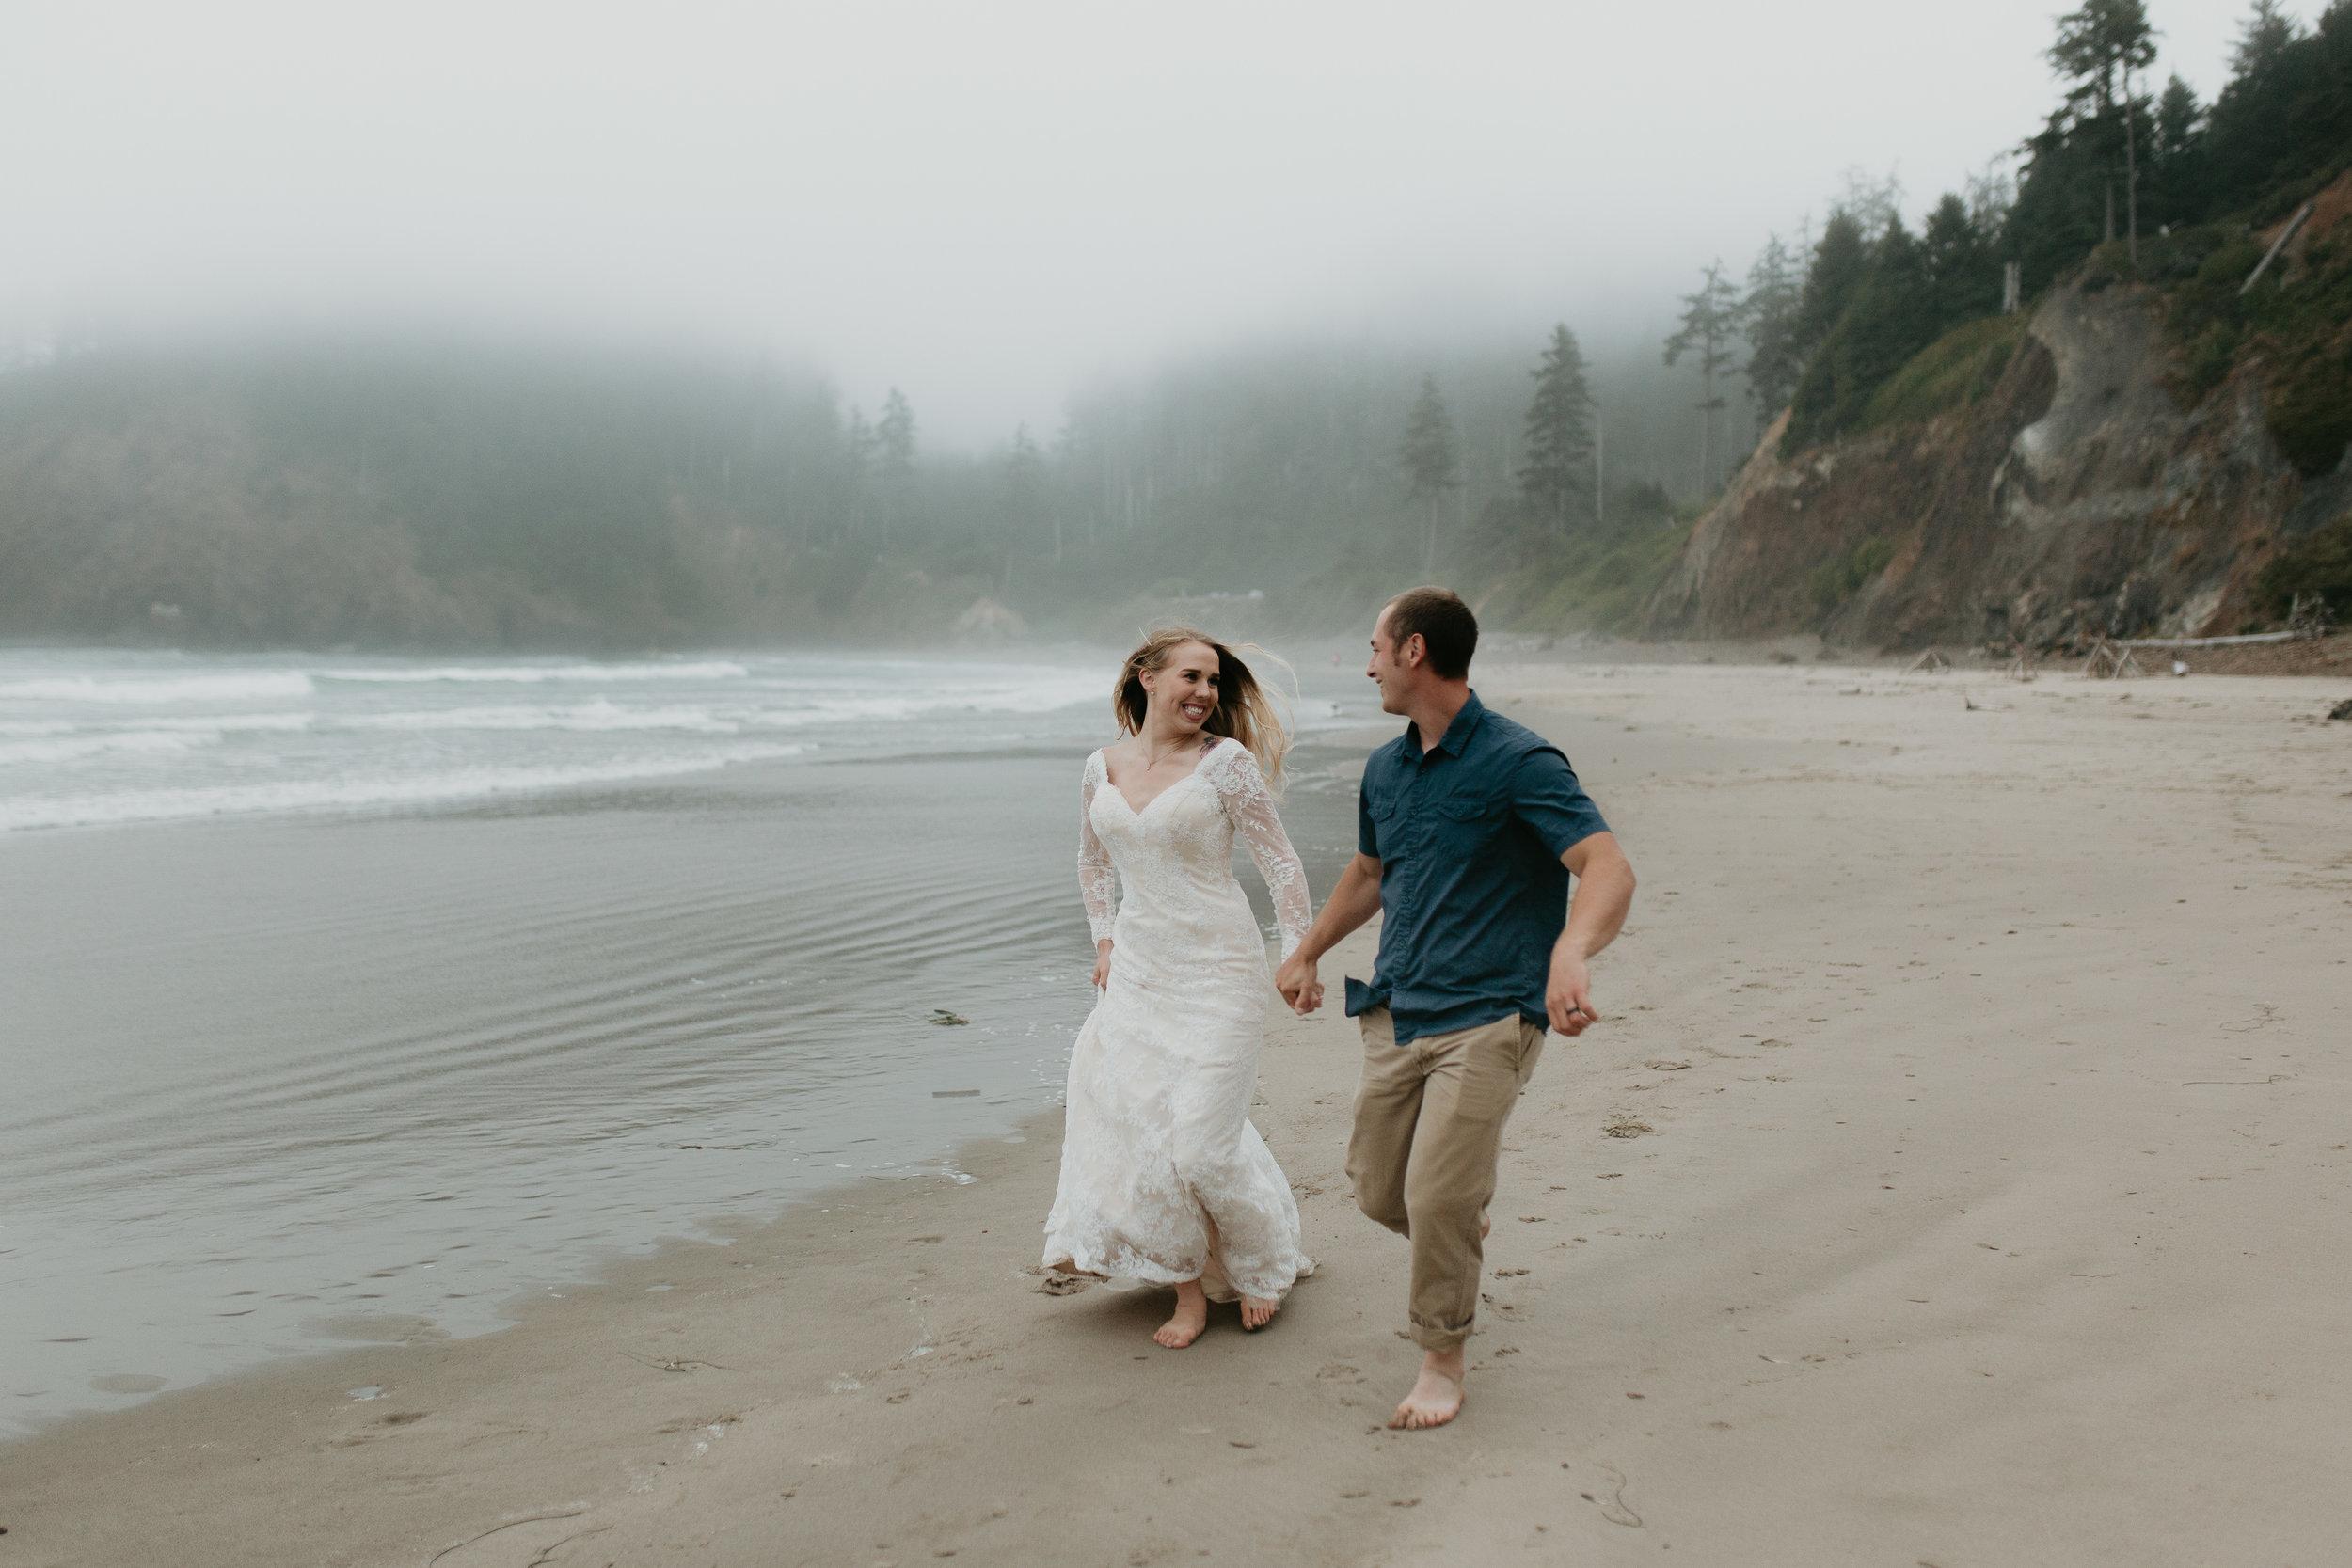 nicole-daacke-photography-ecola-state-park-oregon-elopement-bridal-photos-photographer-for-cannon-beach-elopement-oregon-coast-elopement-photographer-foggy-summer-elopement-cannon-beach-best-adventure-elopement-photographer-7060.jpg